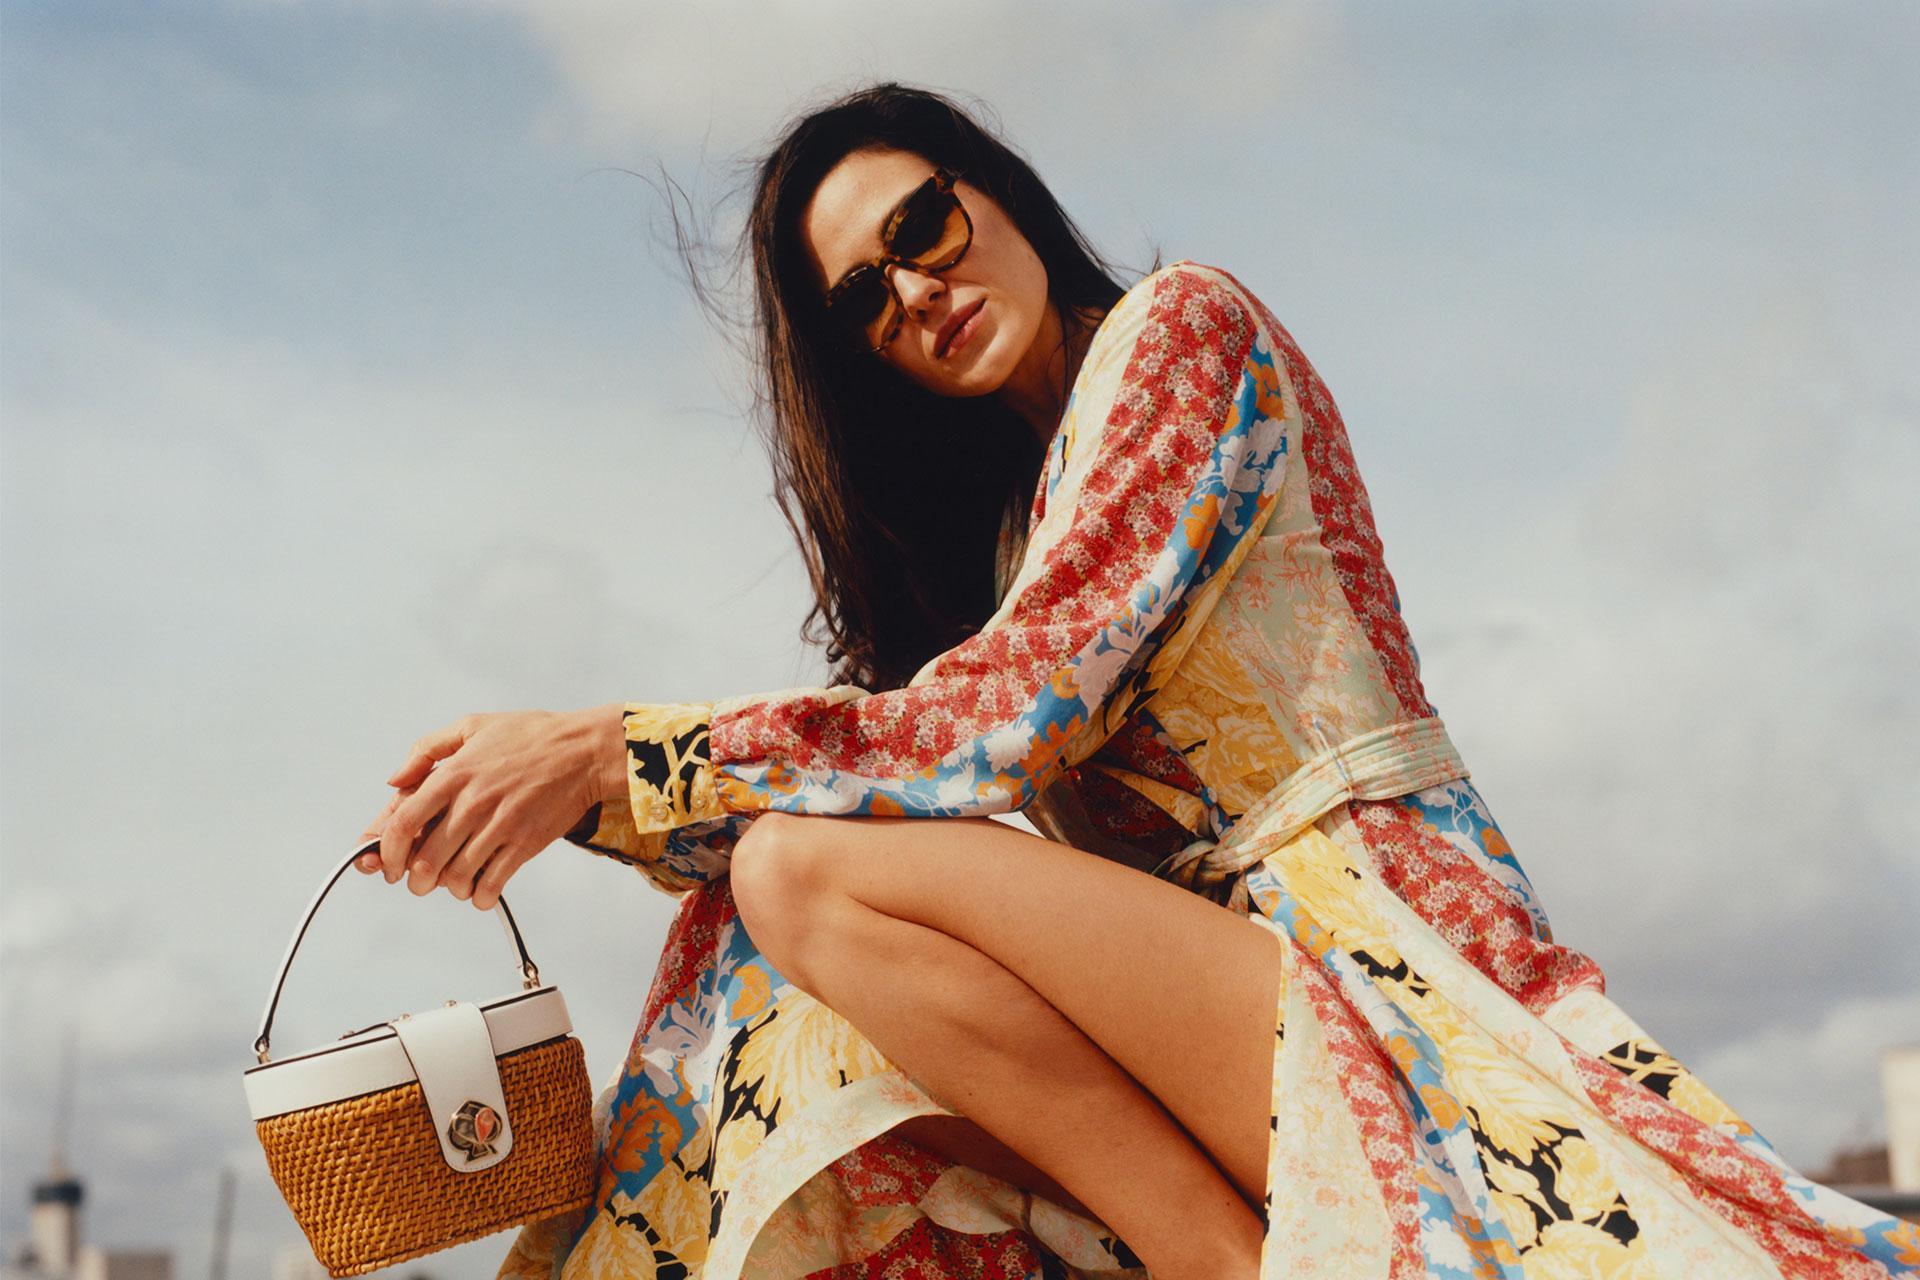 fdf1f0003b Women's Fashion | Discover More & Shop Online | Fenwick